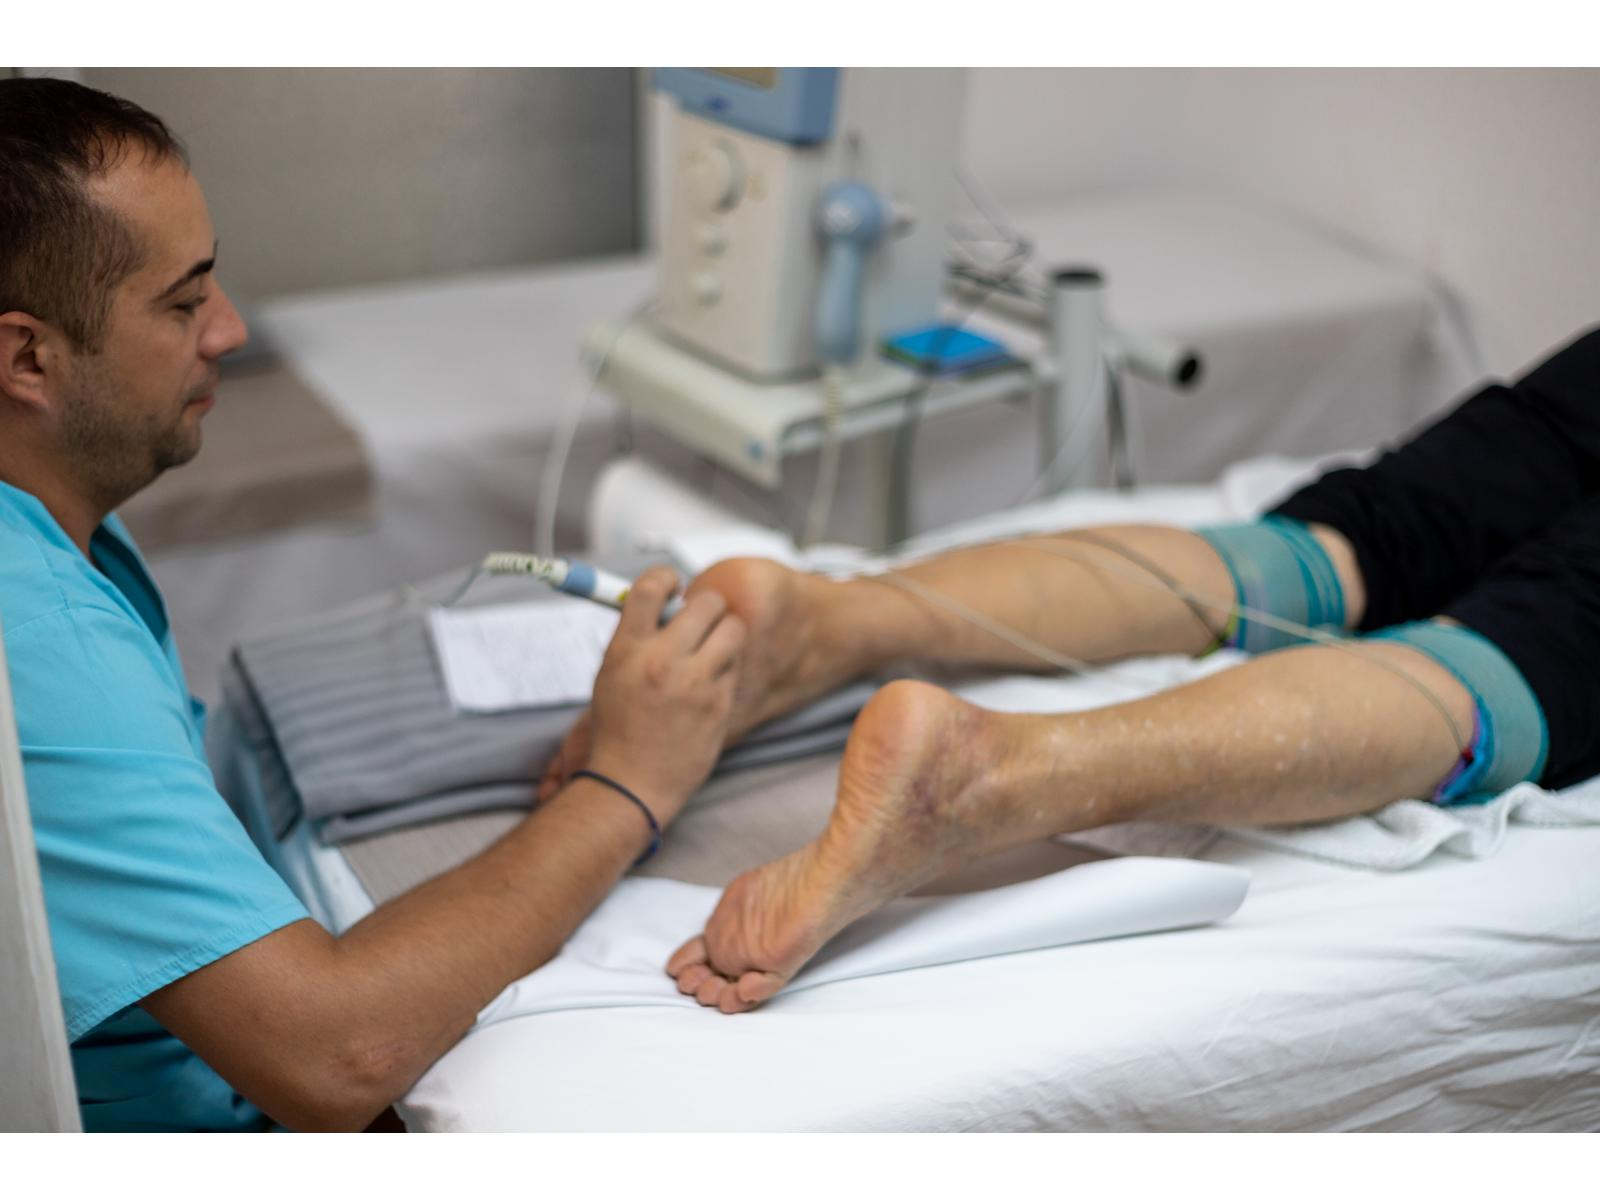 Brotac Medical Oltenita - untitled-7355.jpg